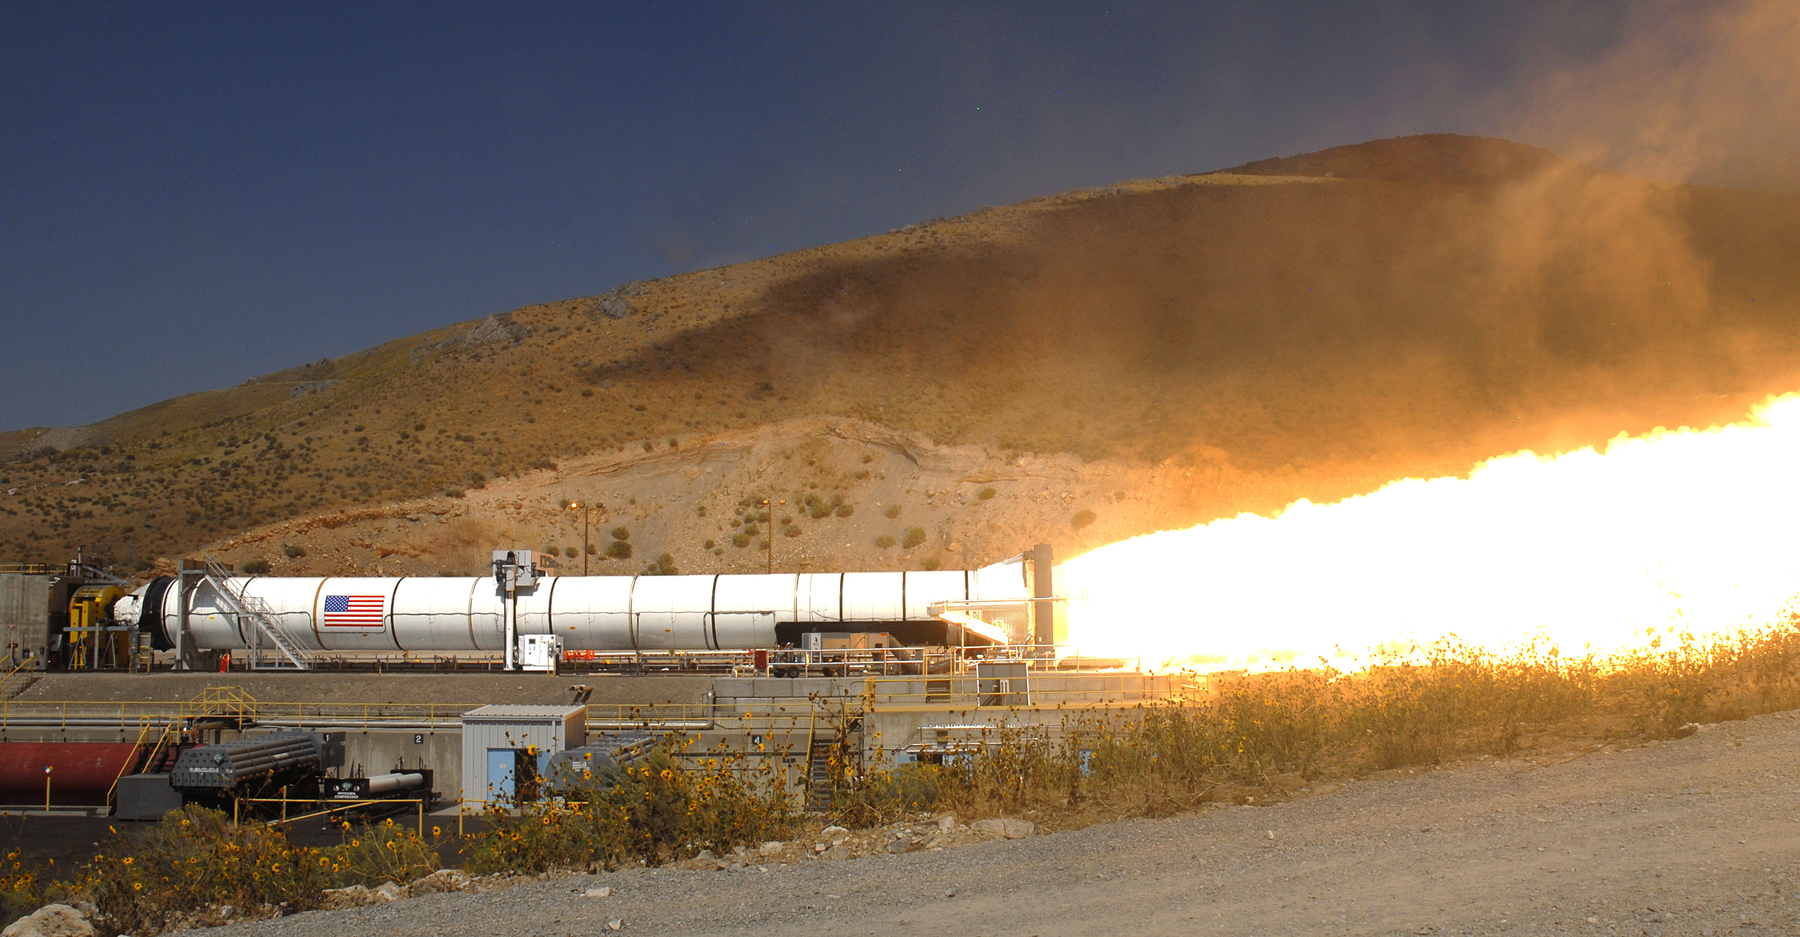 ATK Liberty Rocket Test in DM-3